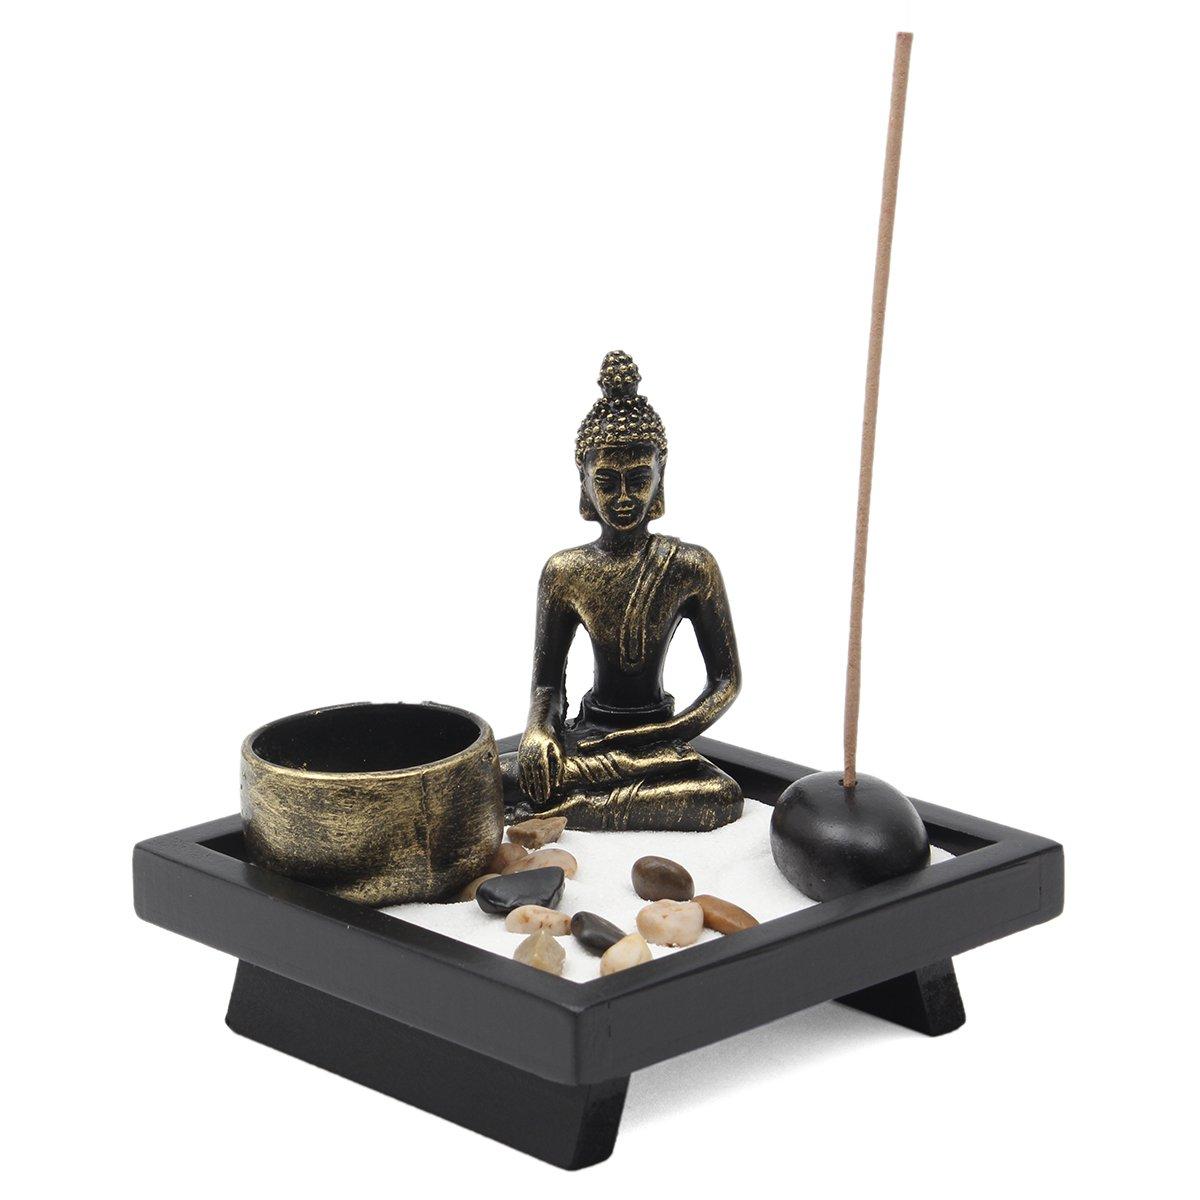 Jeteven Zen Buddha Head Ornament Statue Candle Holders Homware present Gift Set